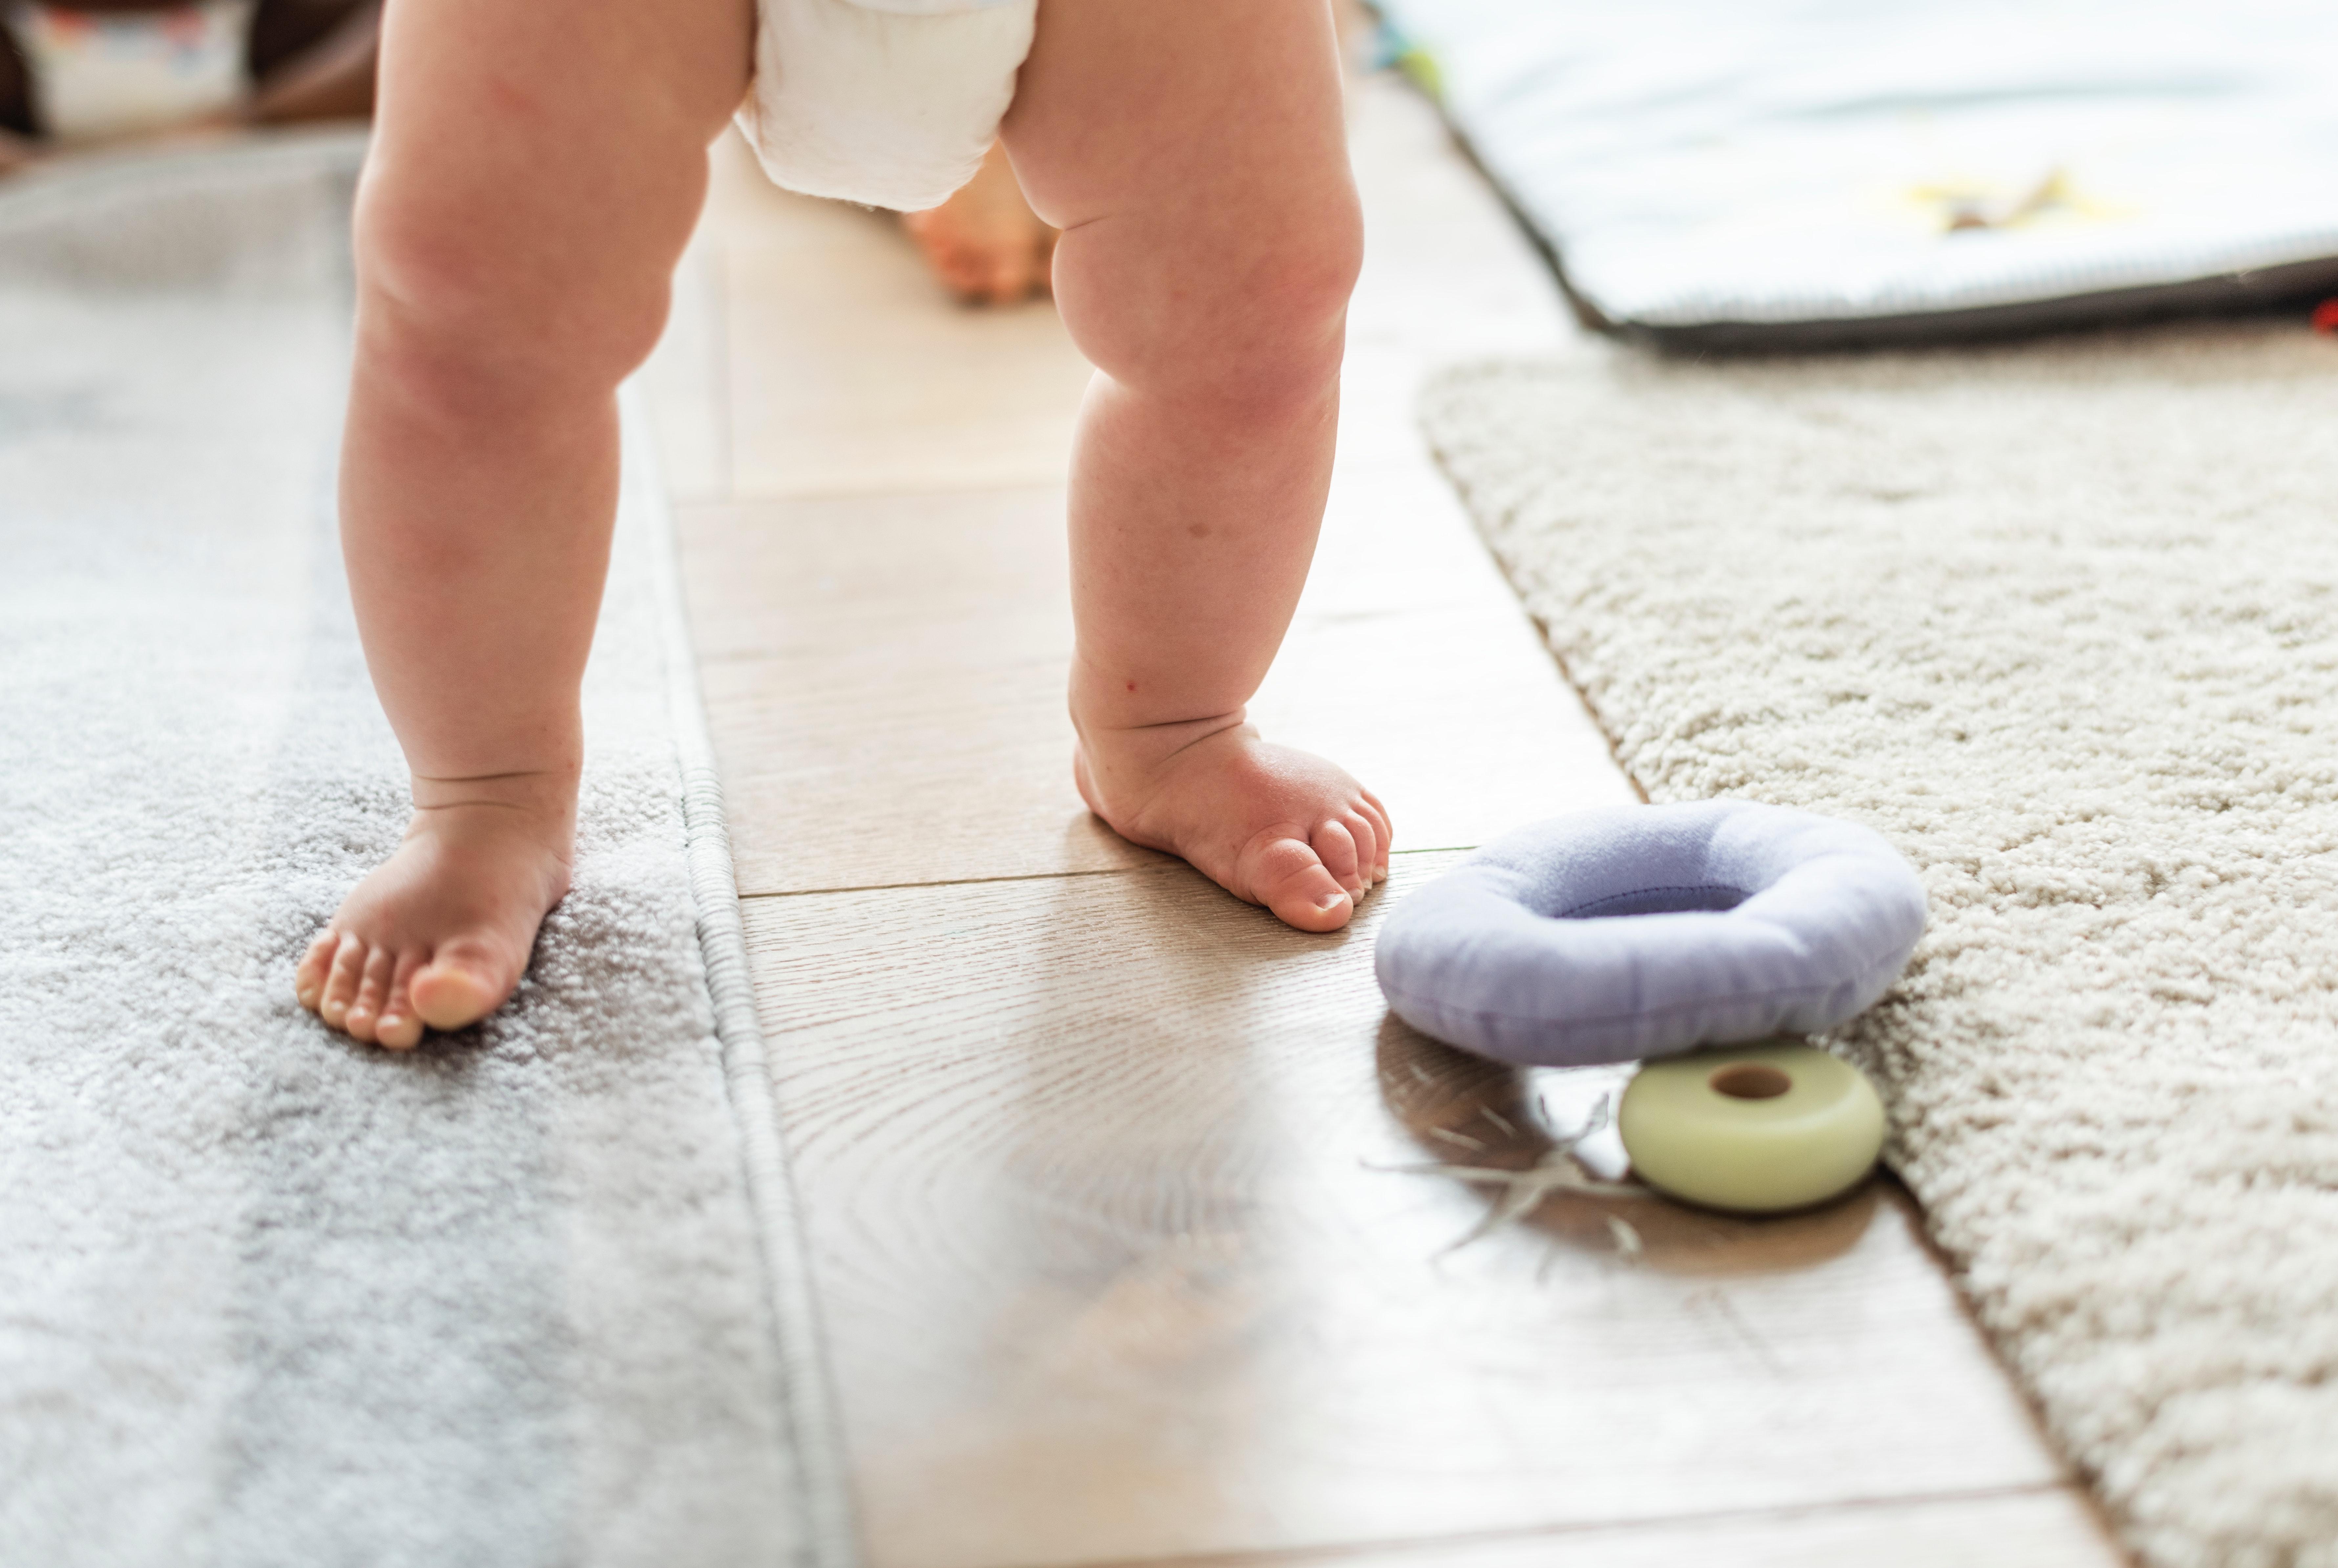 Baby wearing diaper